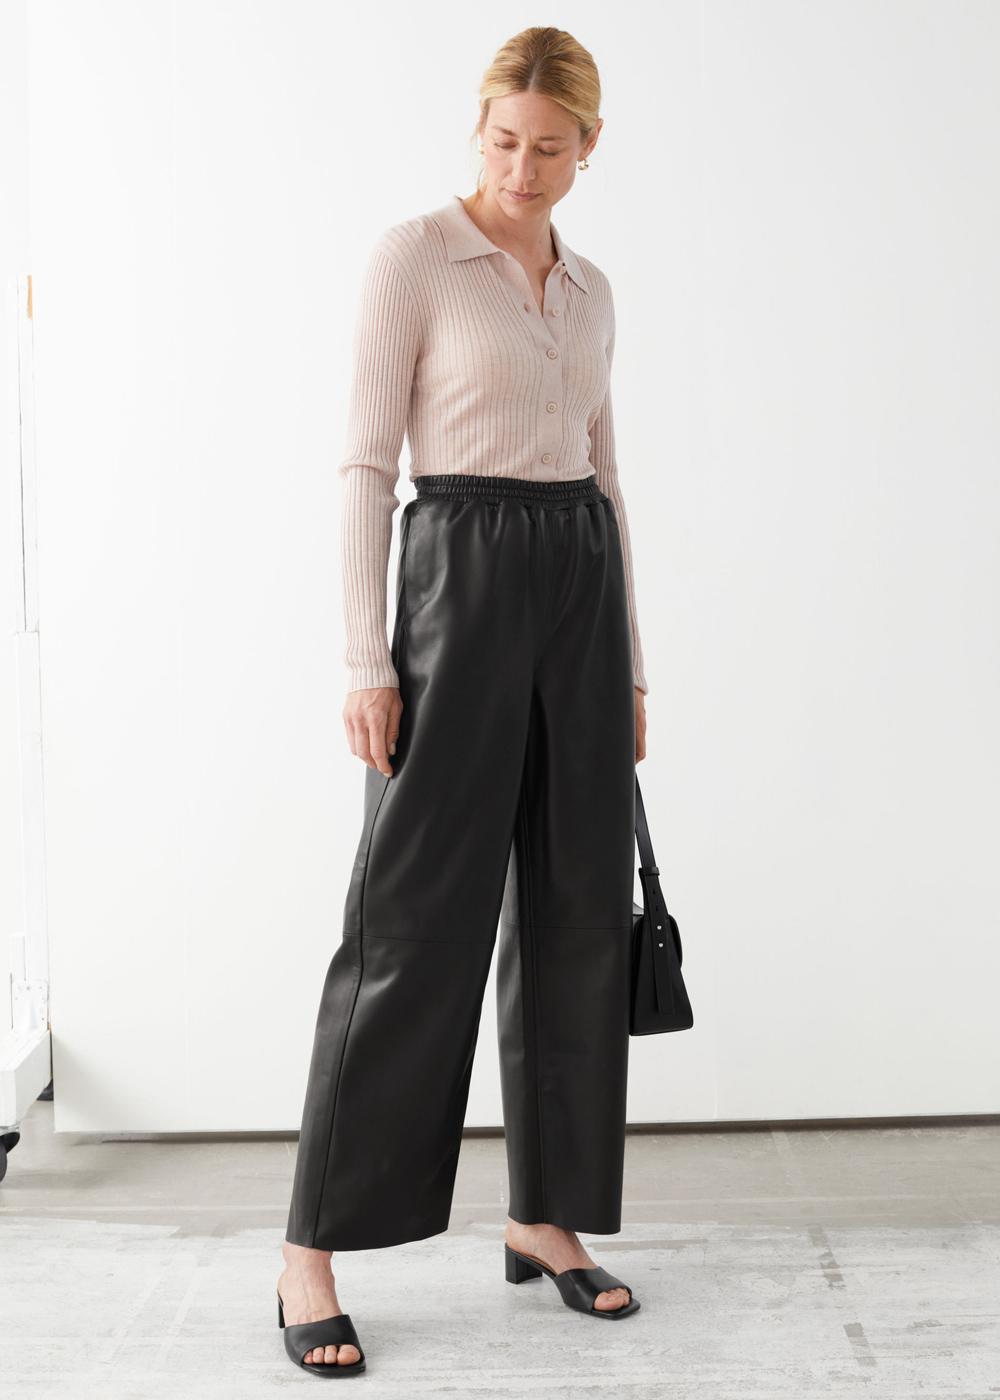 & Other Stories kožne hlače jogger model 2021.